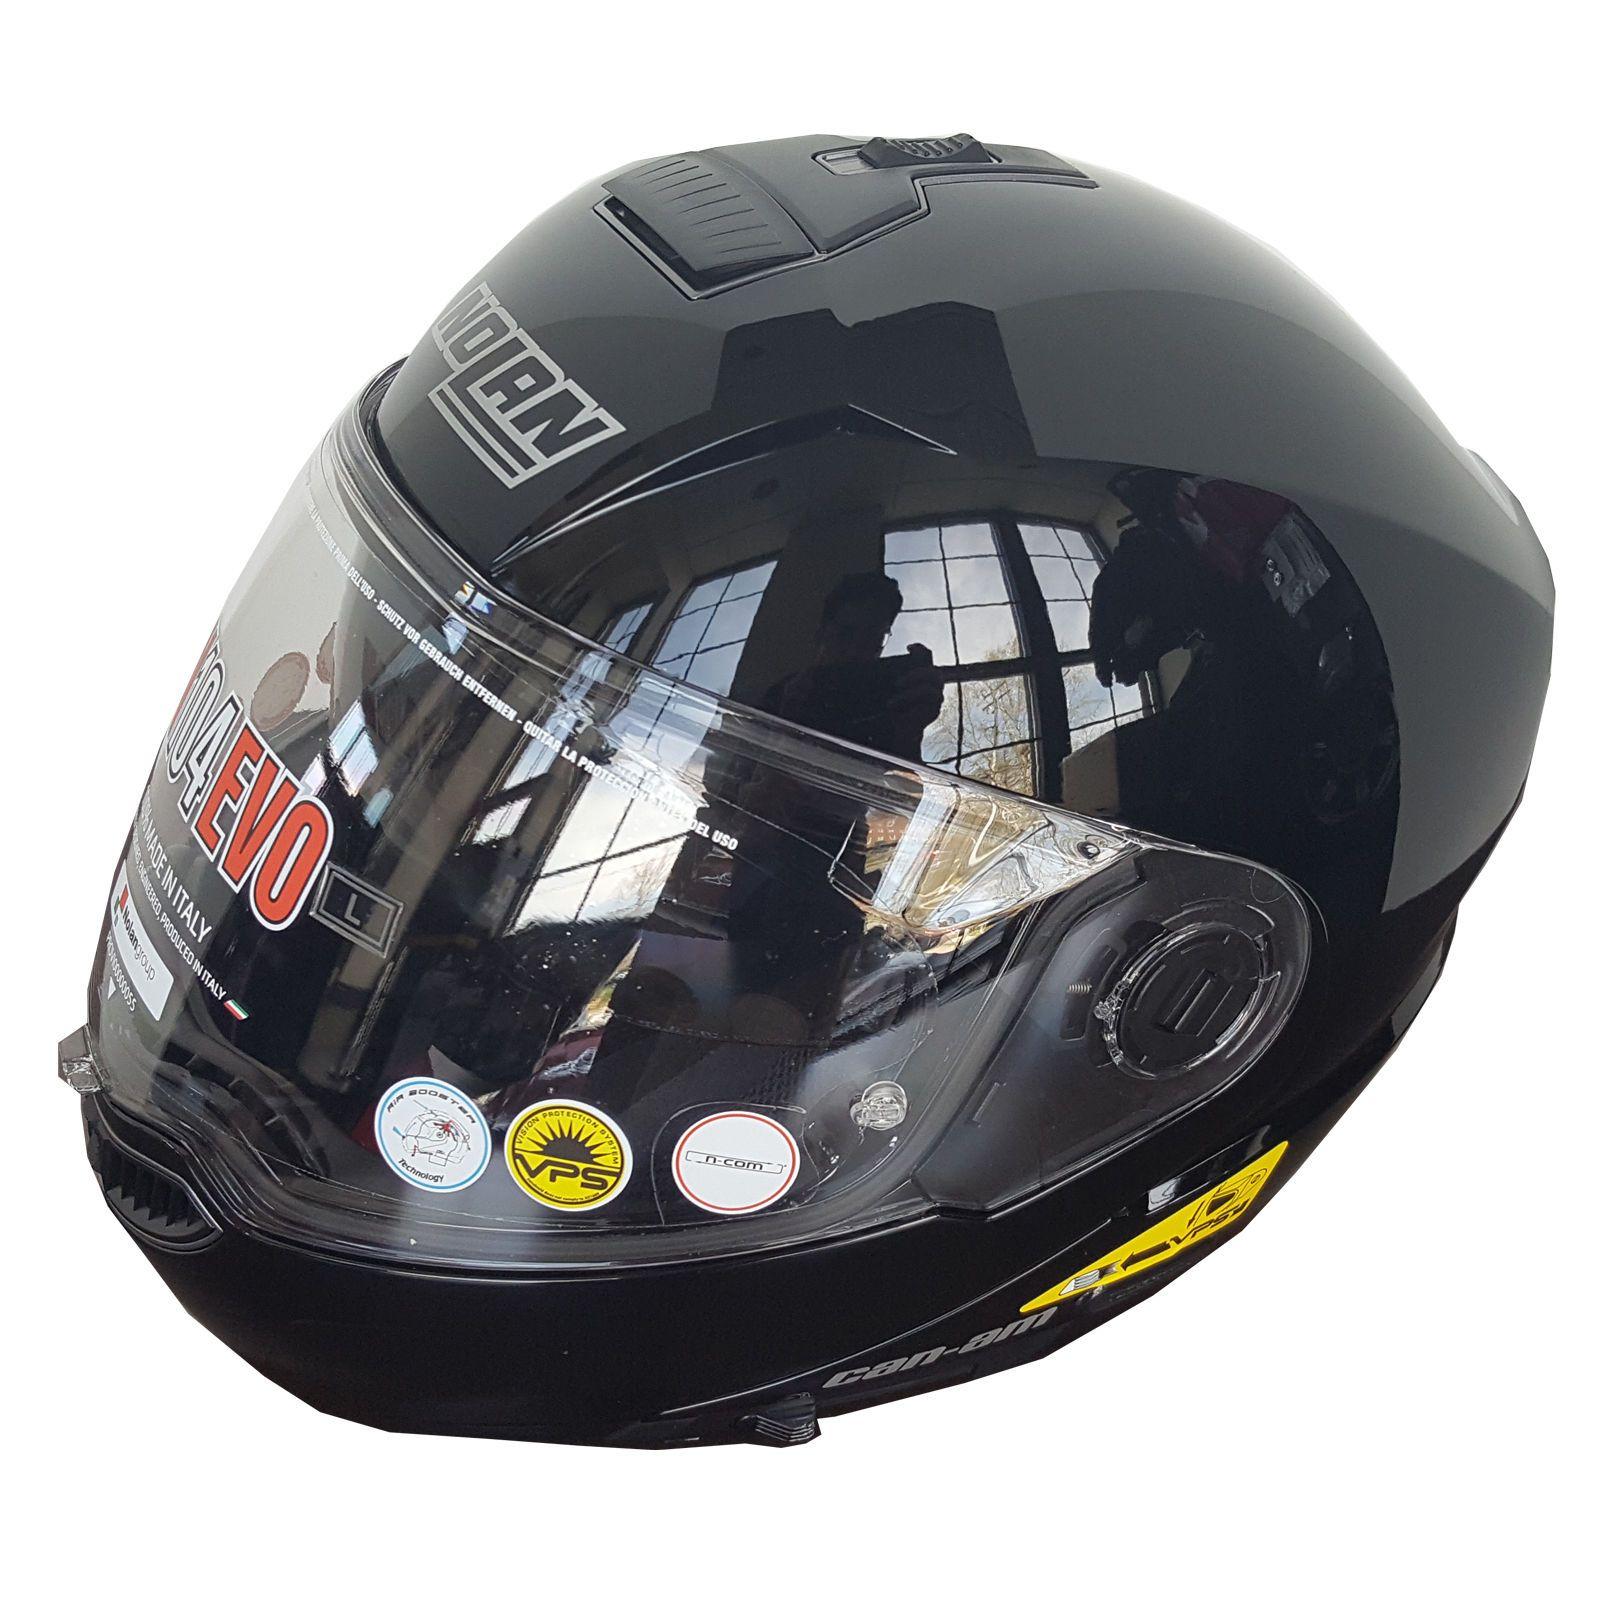 Apparel nolan n evo helmet can am xlarge black brand new